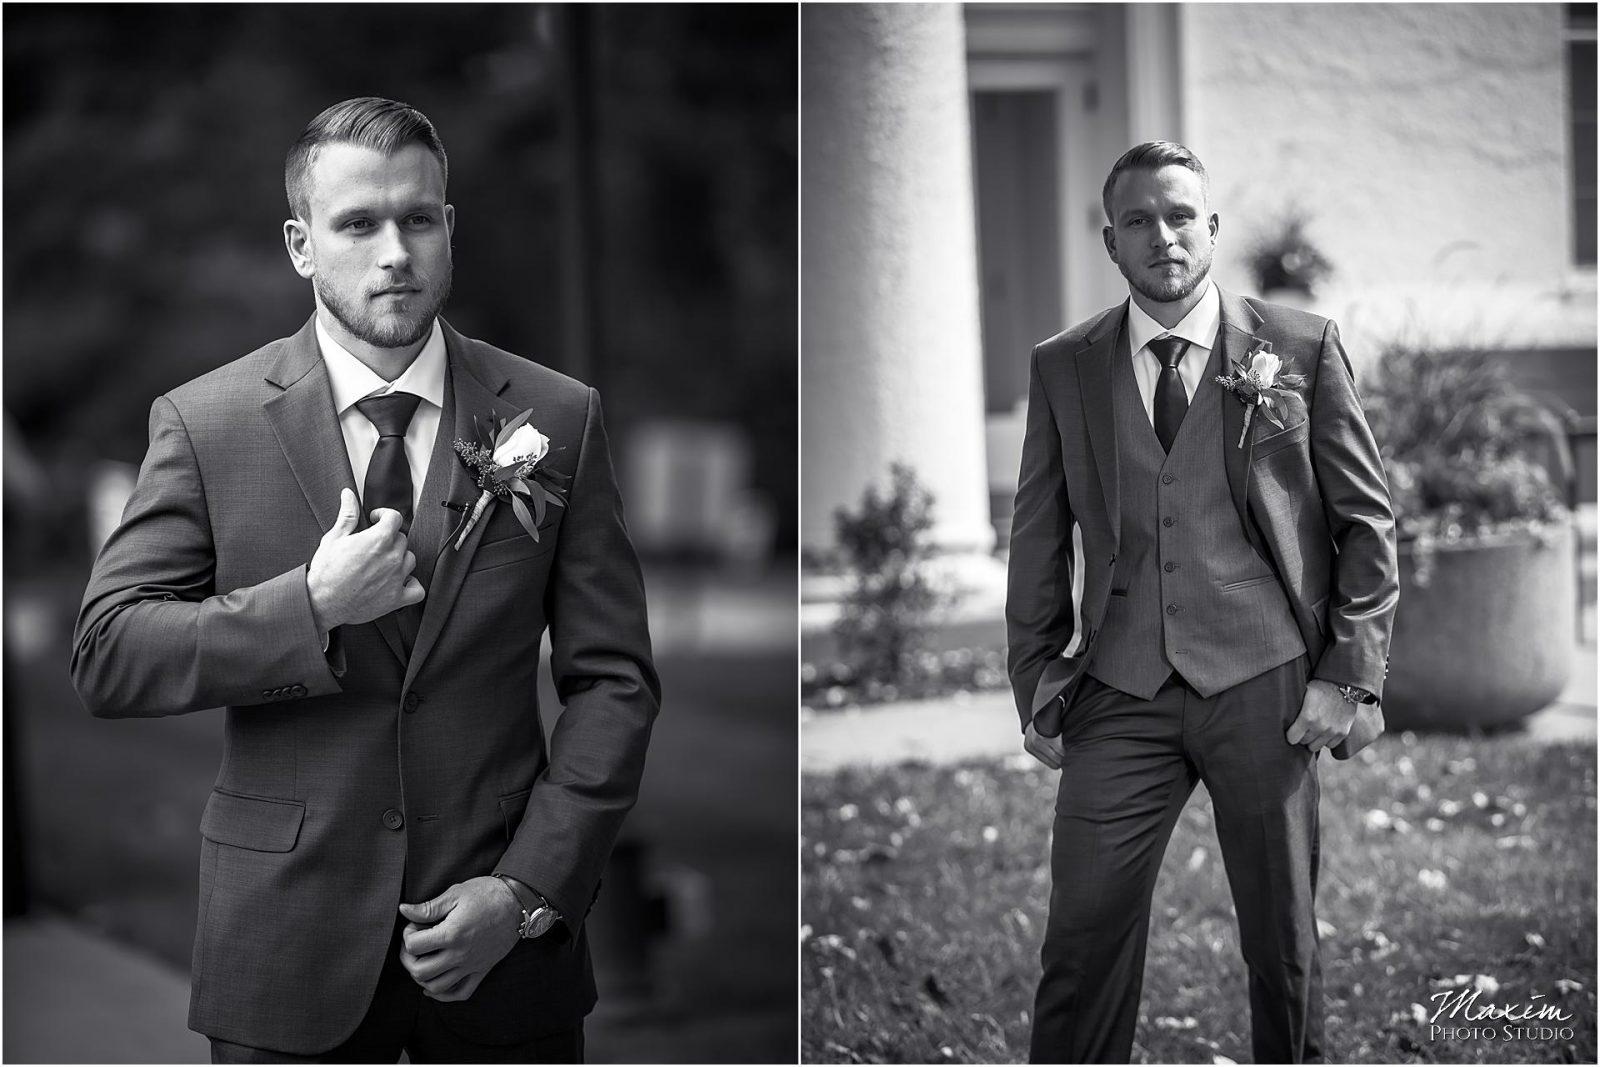 Kentucky Wedding Photographers, Groom Bride First Look pictures